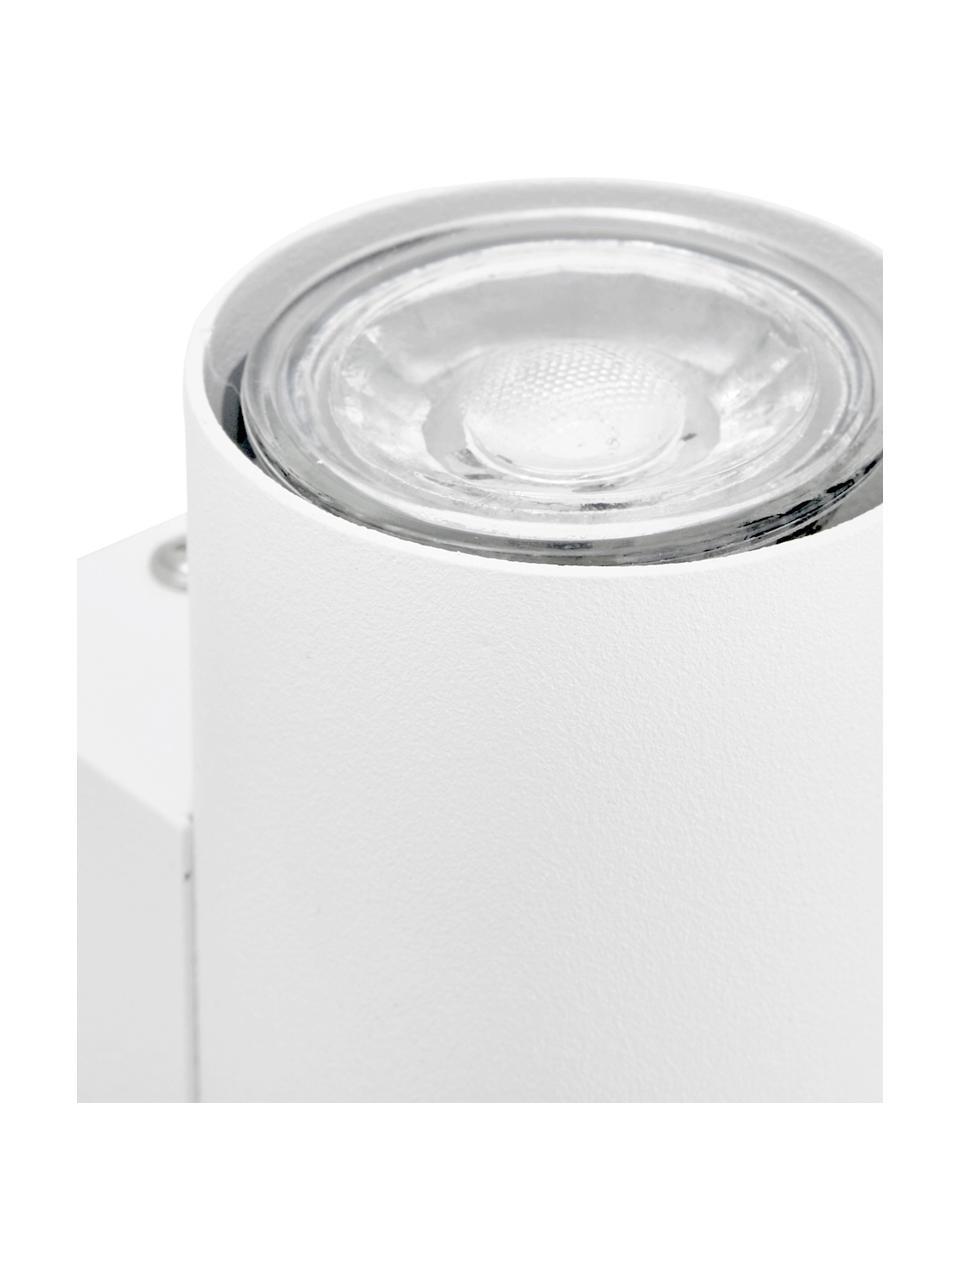 Wandstrahler Paul, Lampenschirm: Metall, pulverbeschichtet, Weiß, 6 x 9 cm